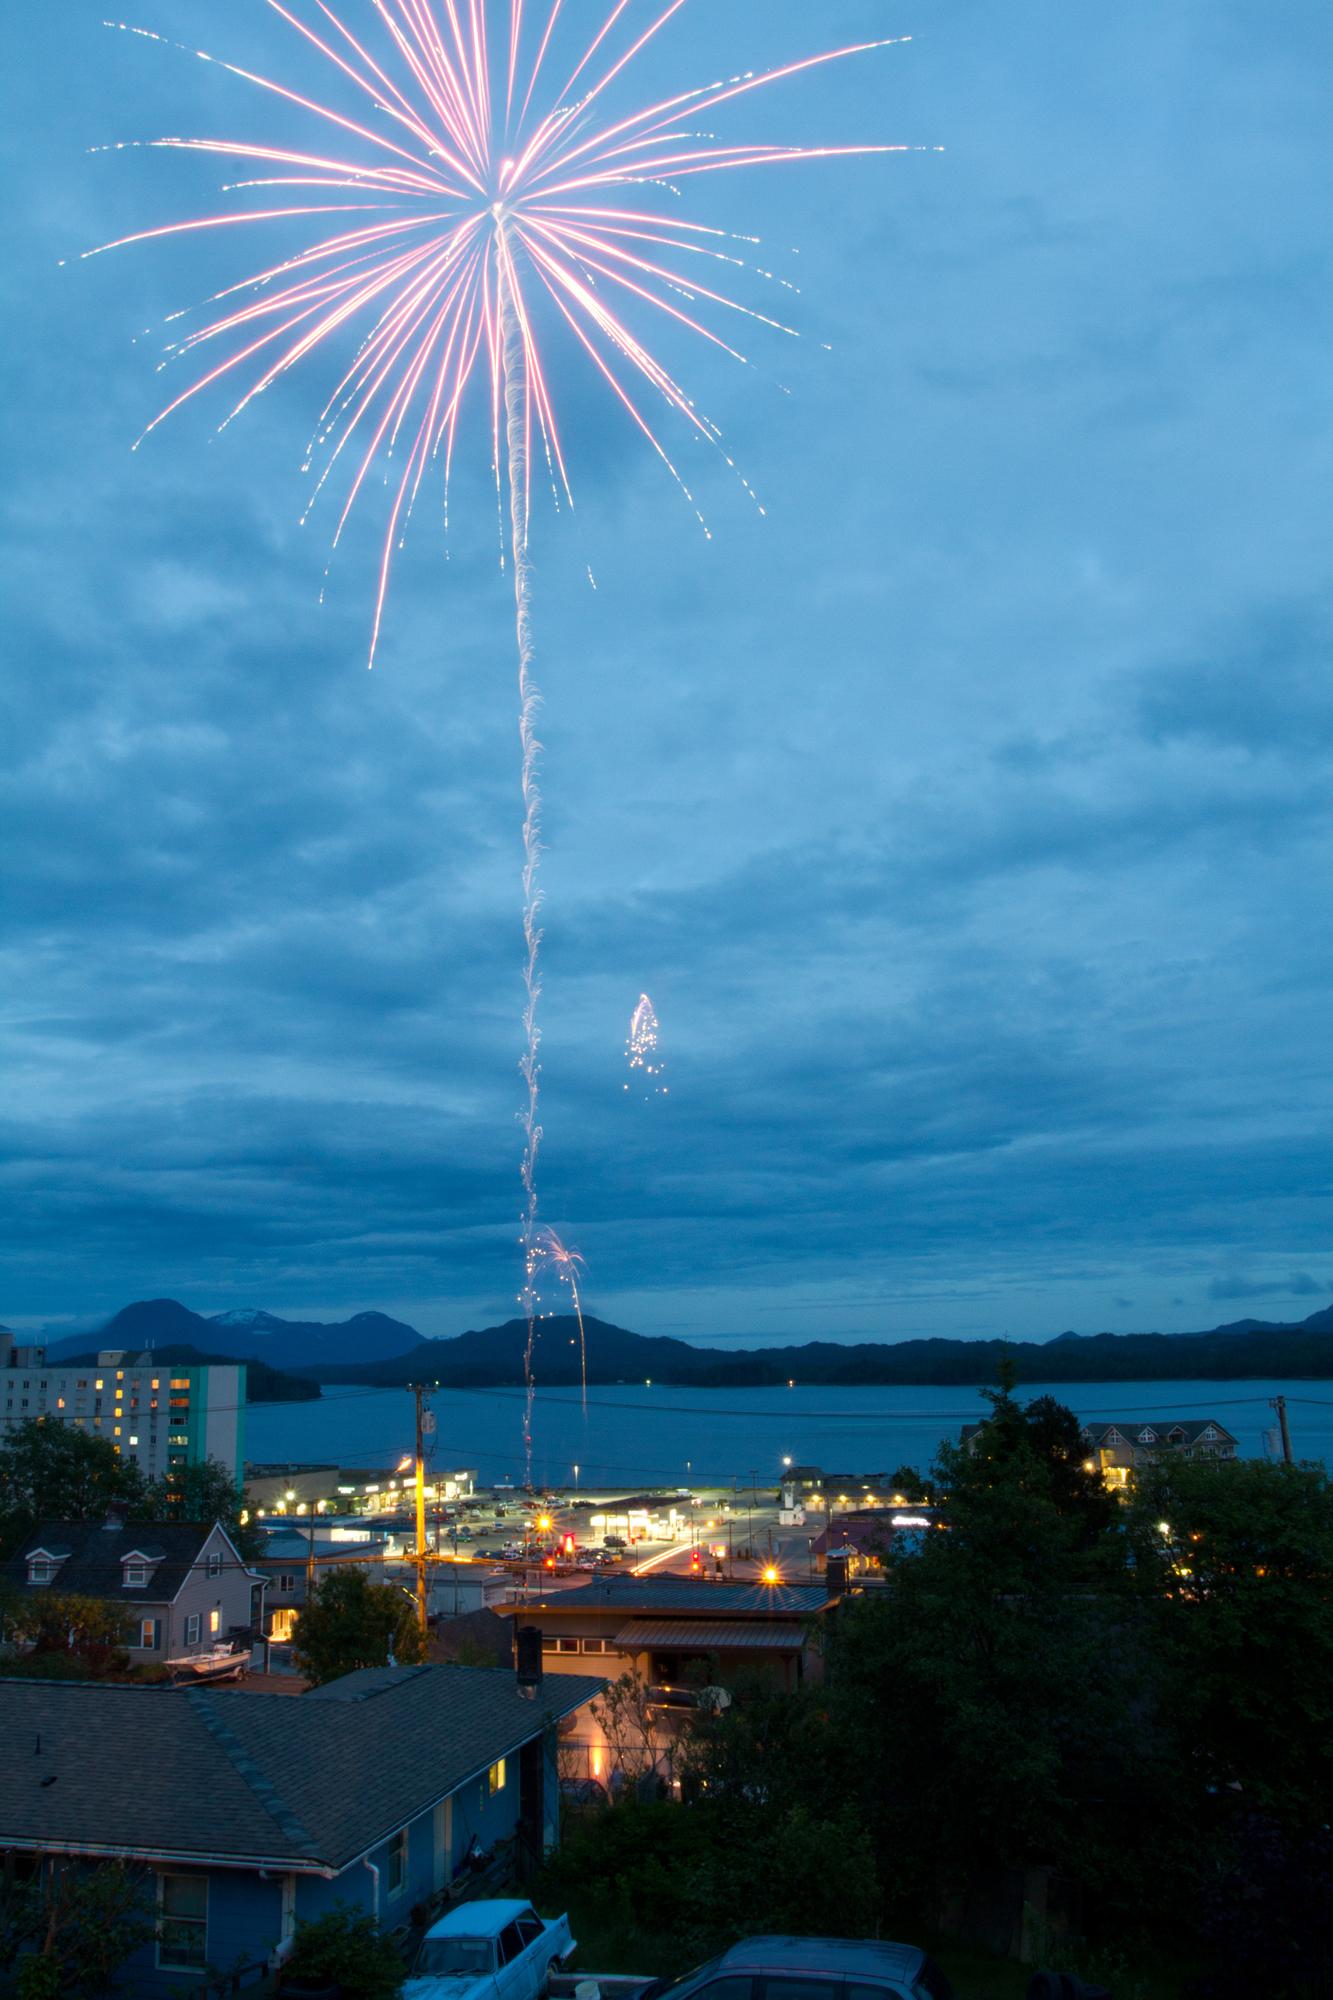 2012-shotbyjake.com-2108